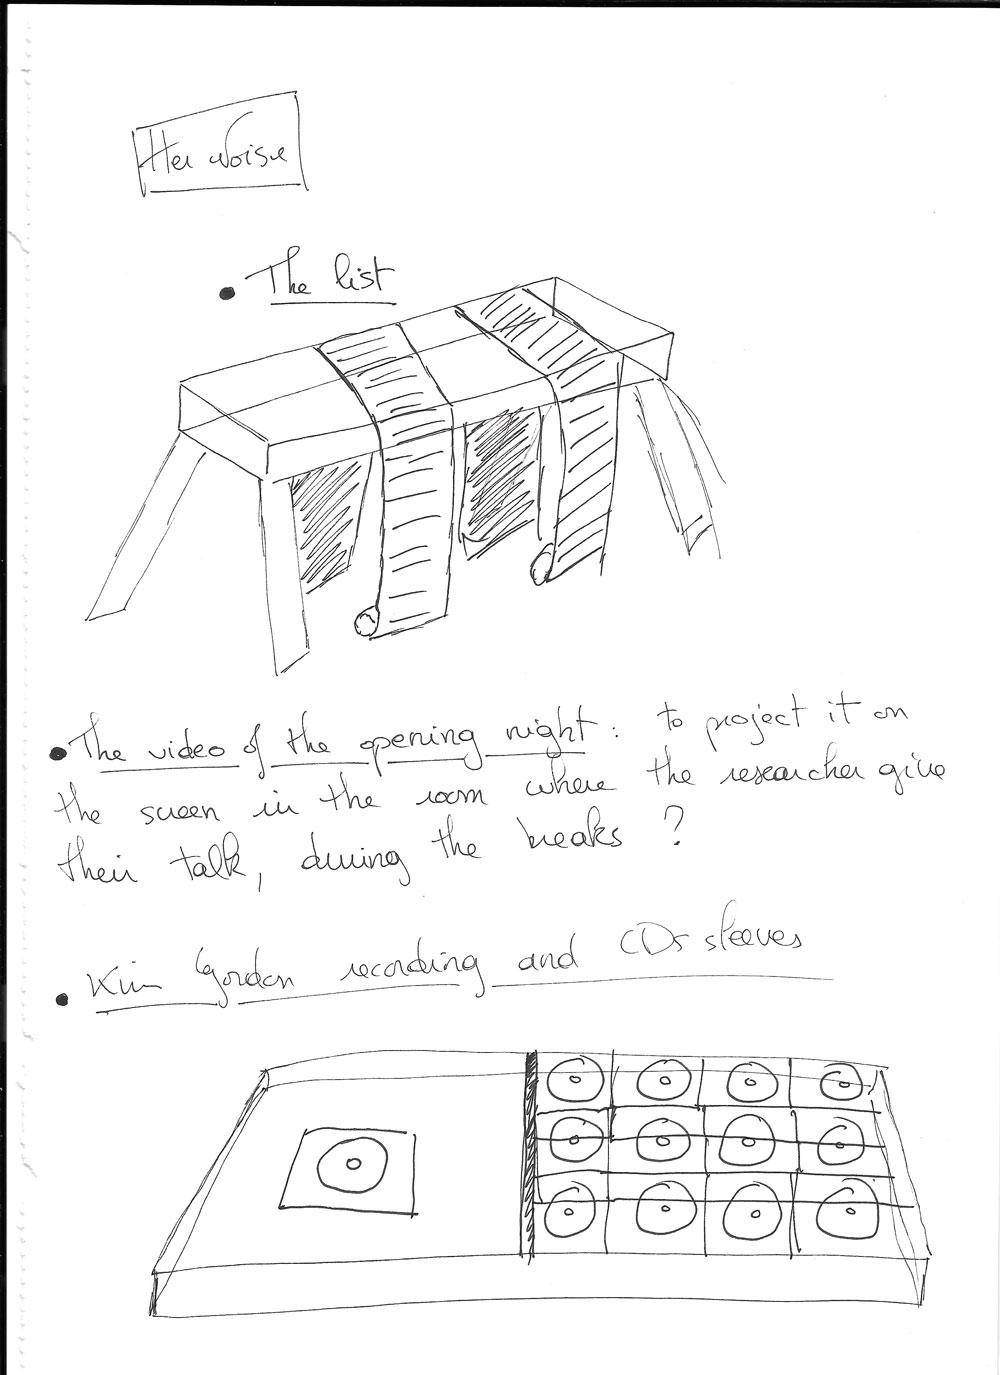 Sketch by Maxime Laparade